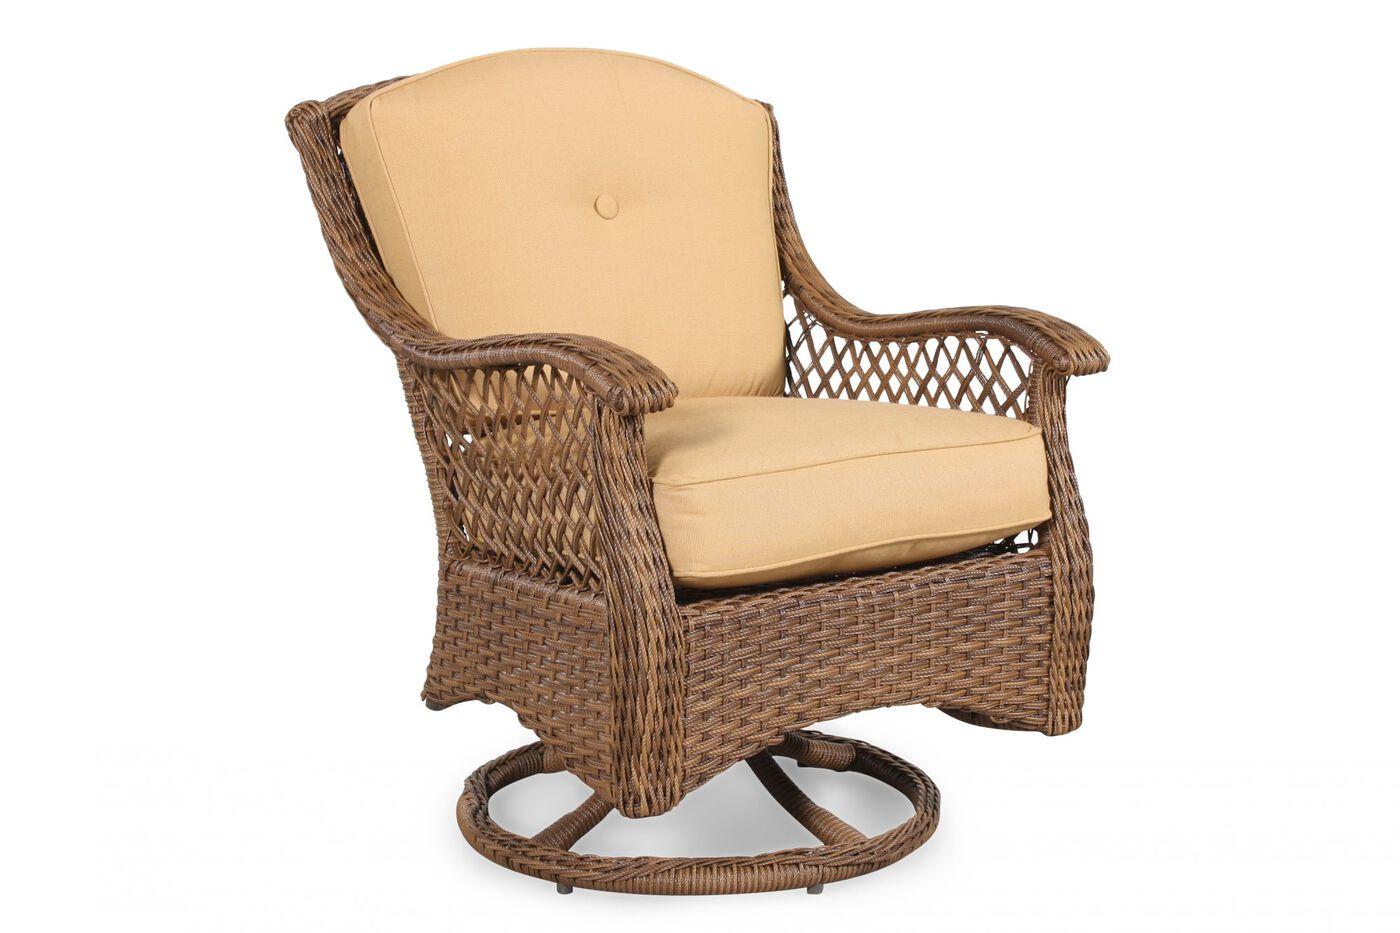 Agio Veranda Patio Swivel Rocker Chair